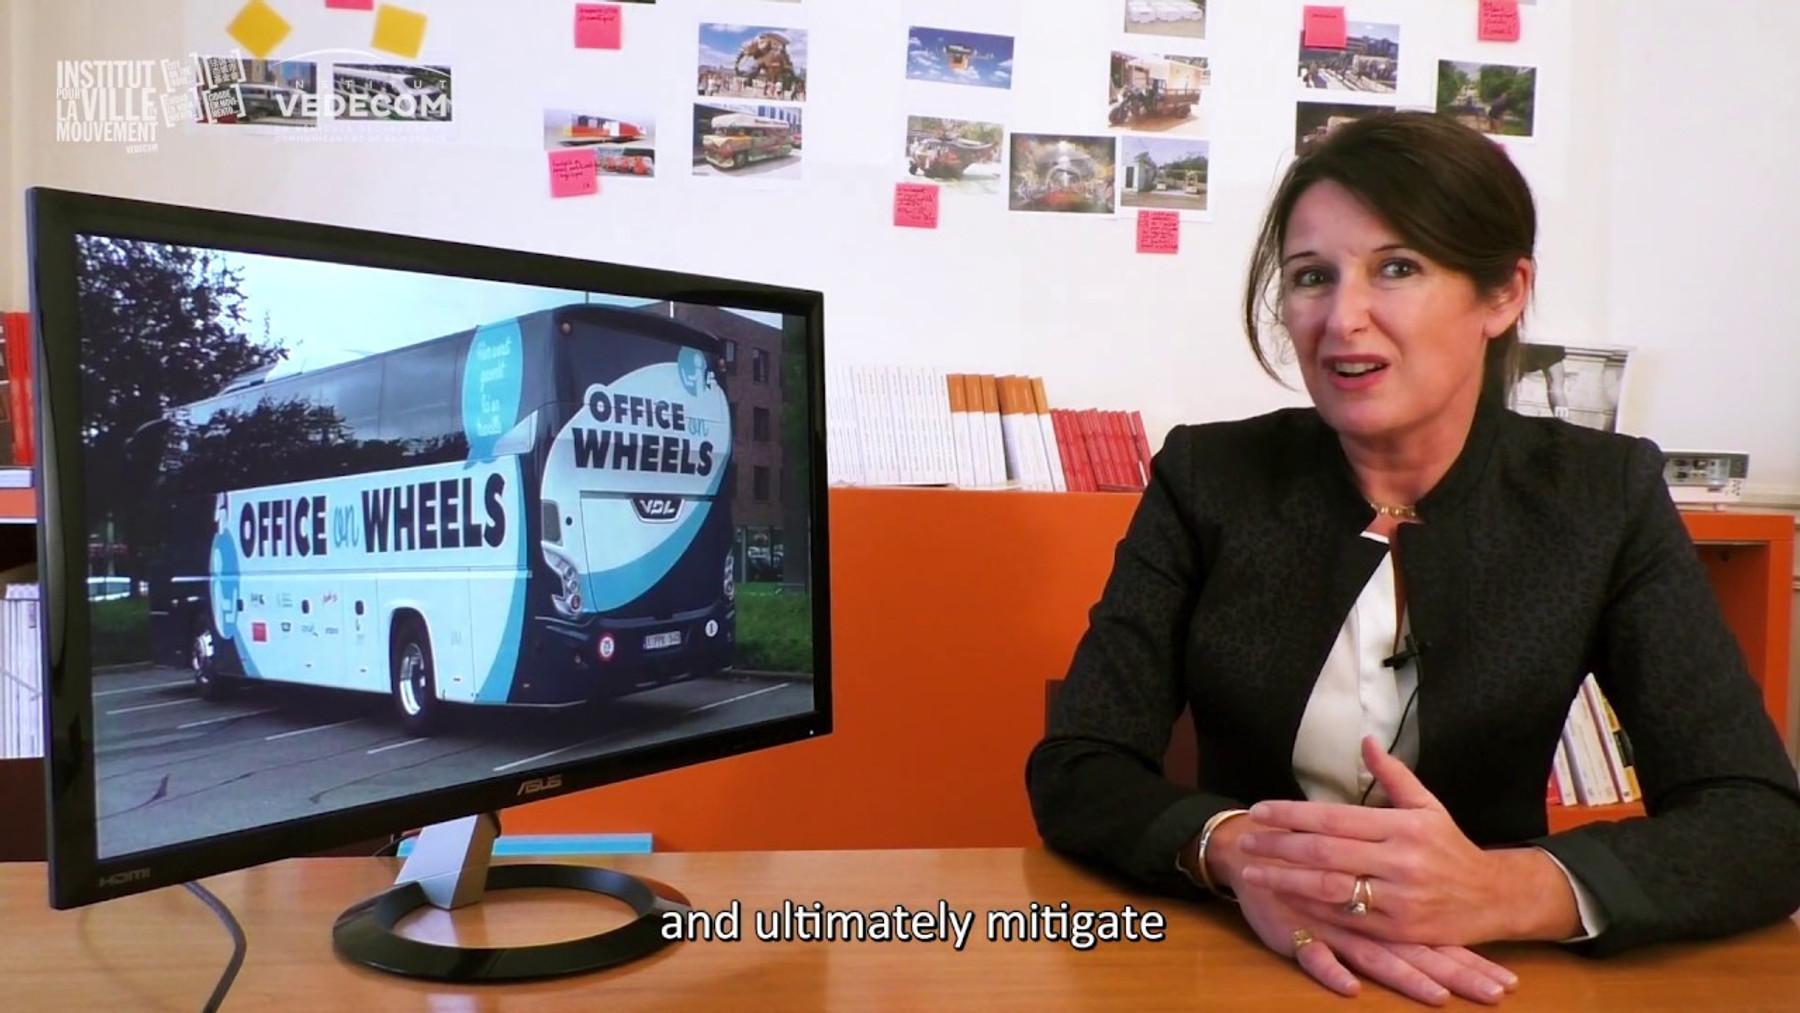 Office on wheels in Belgium